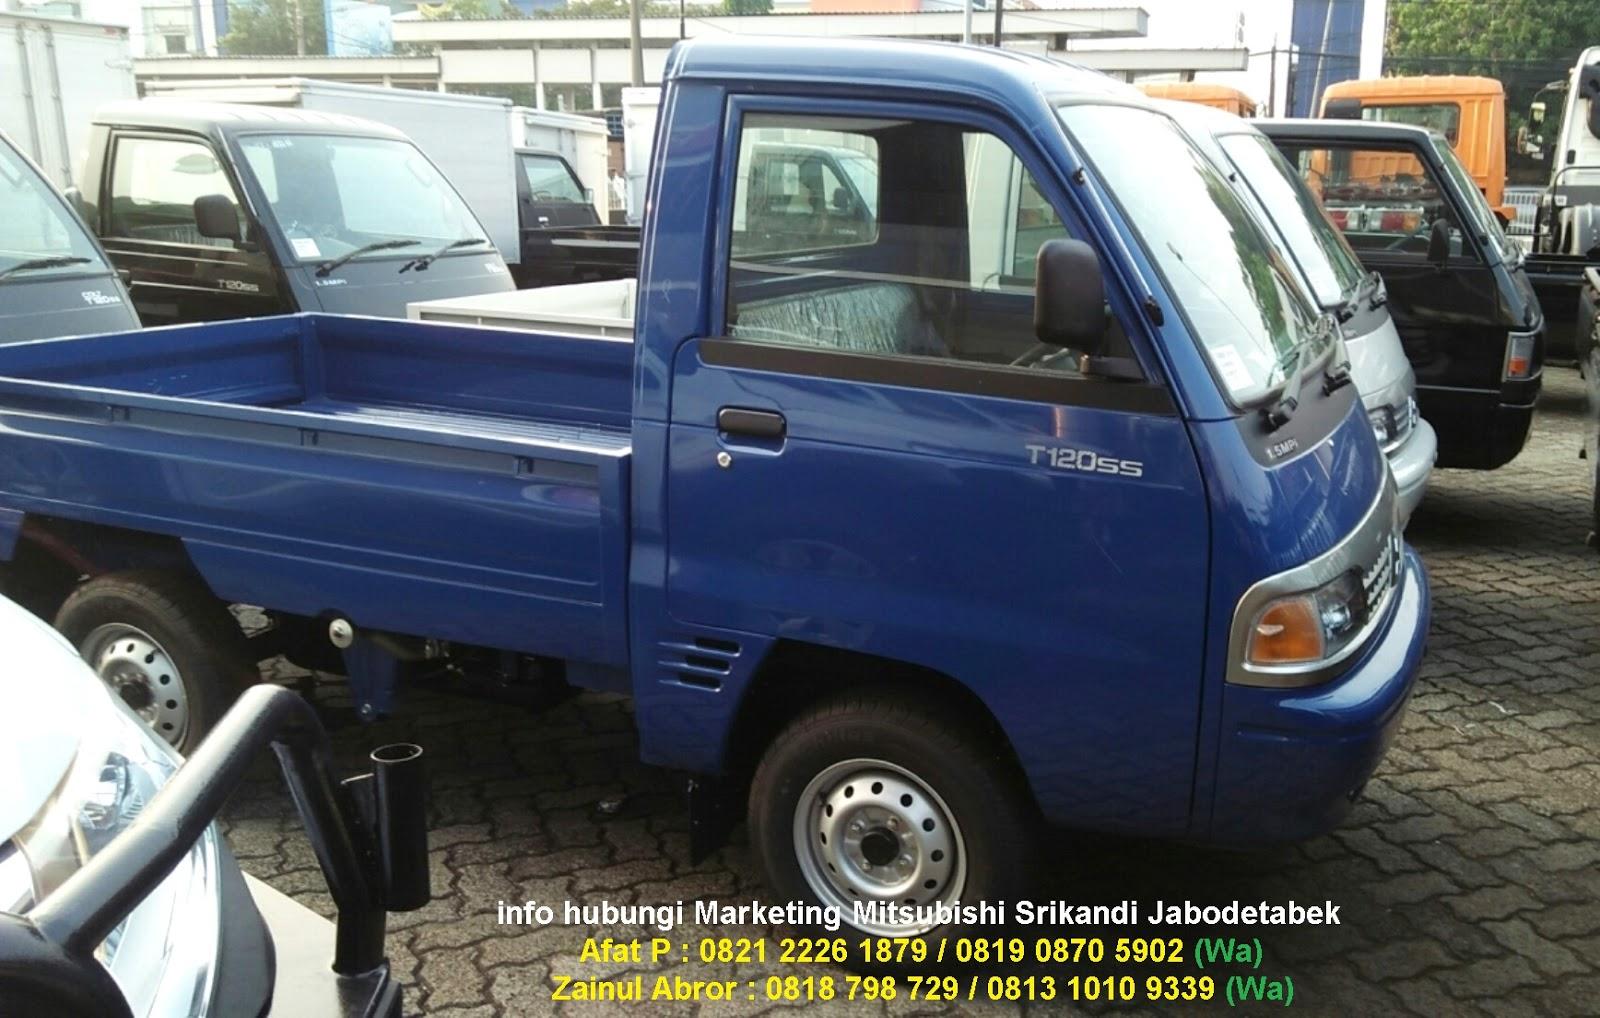 Dealer Mitsubishi Niaga Dki Jakarta : Harga Mitsubishi